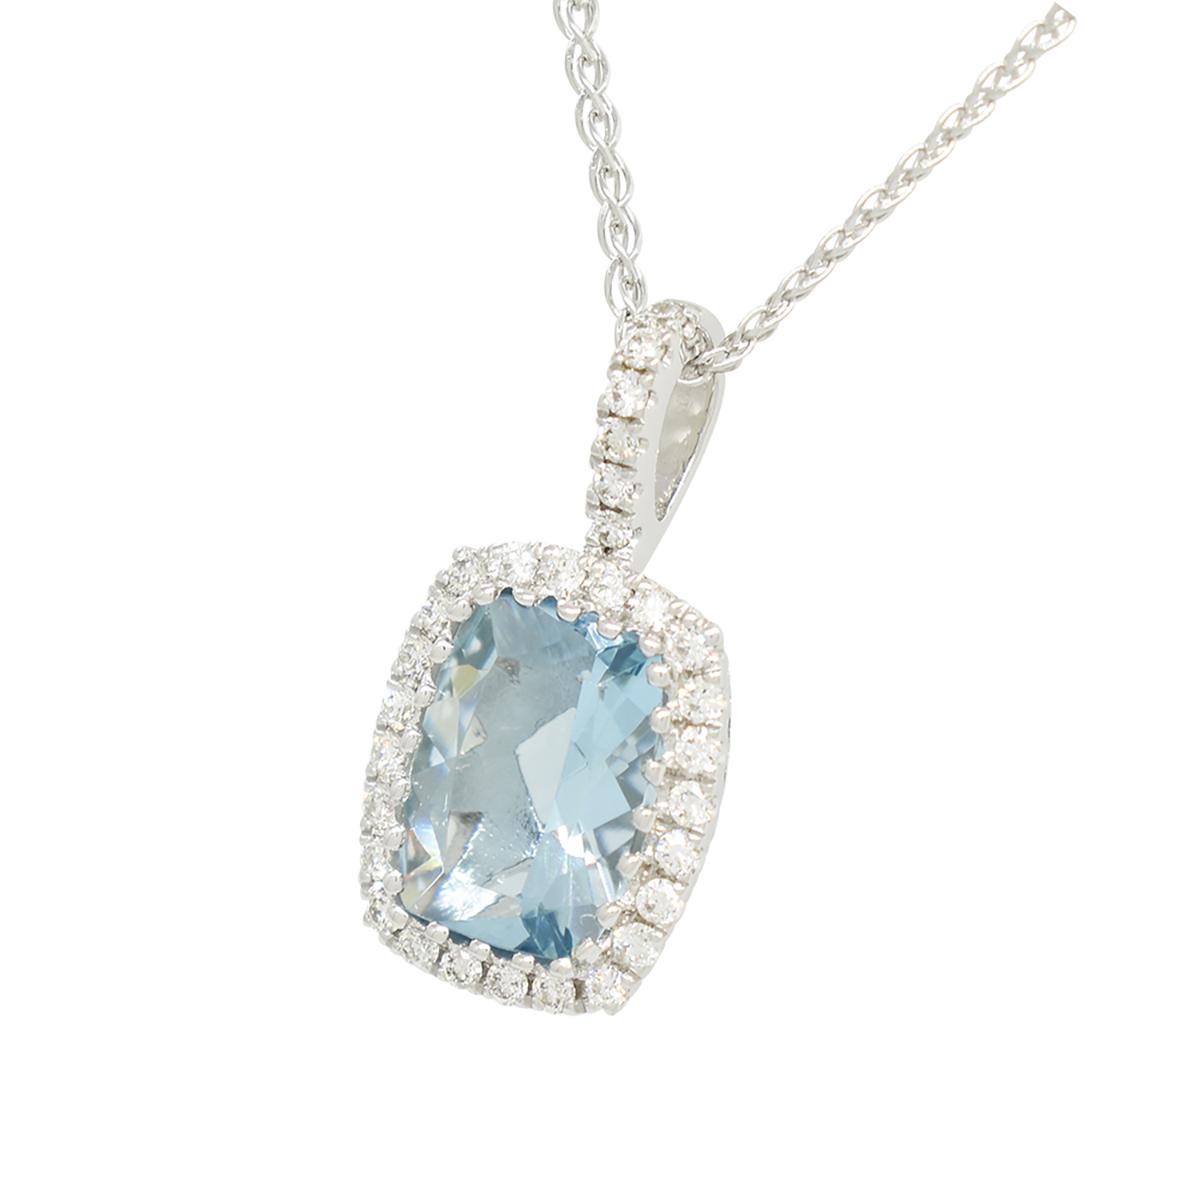 aquamarine-and-diamond-necklace-with-stunning-cushion-cut-aquamarine-and-diamond-halo